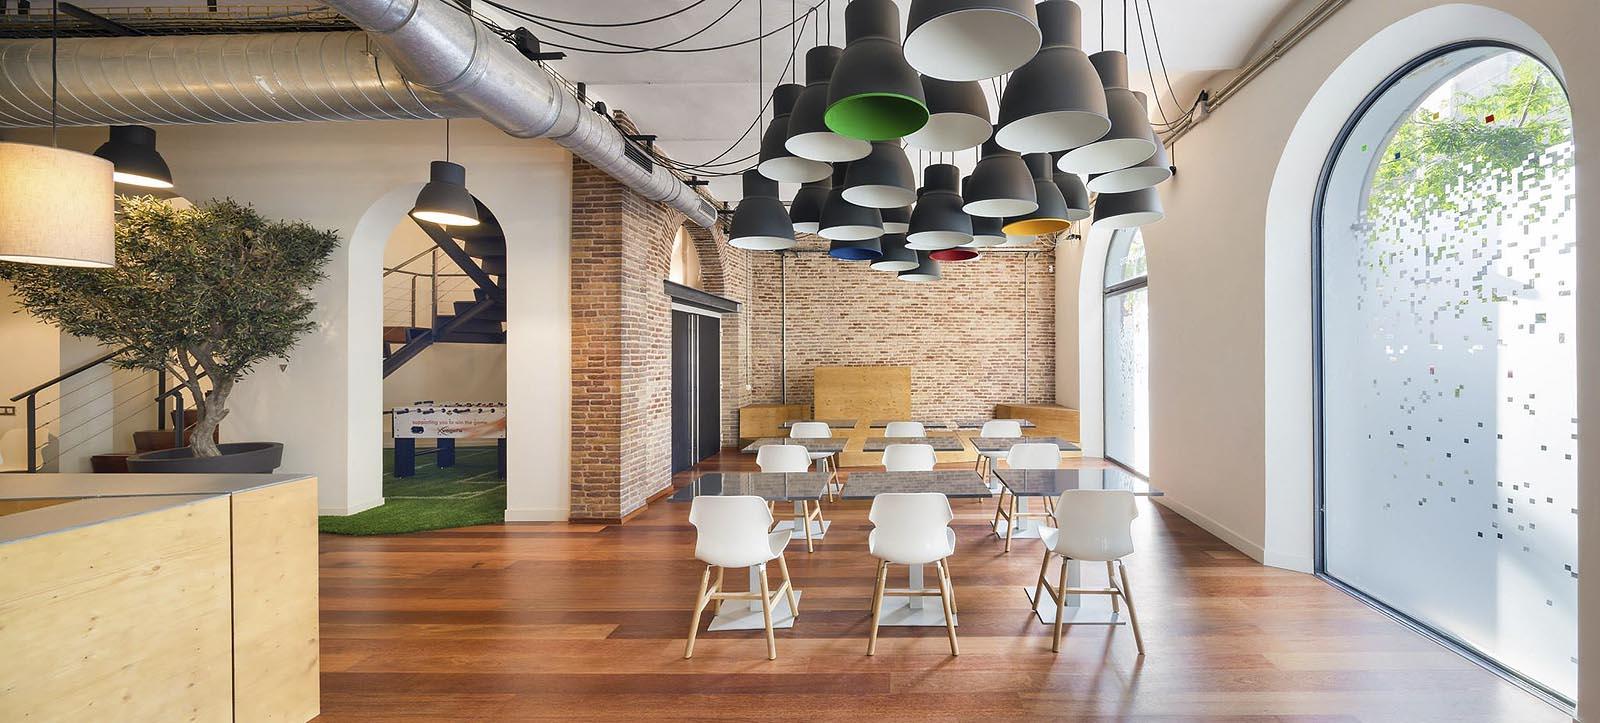 Oficinas manifiesto magrada - Diseno interiores barcelona ...